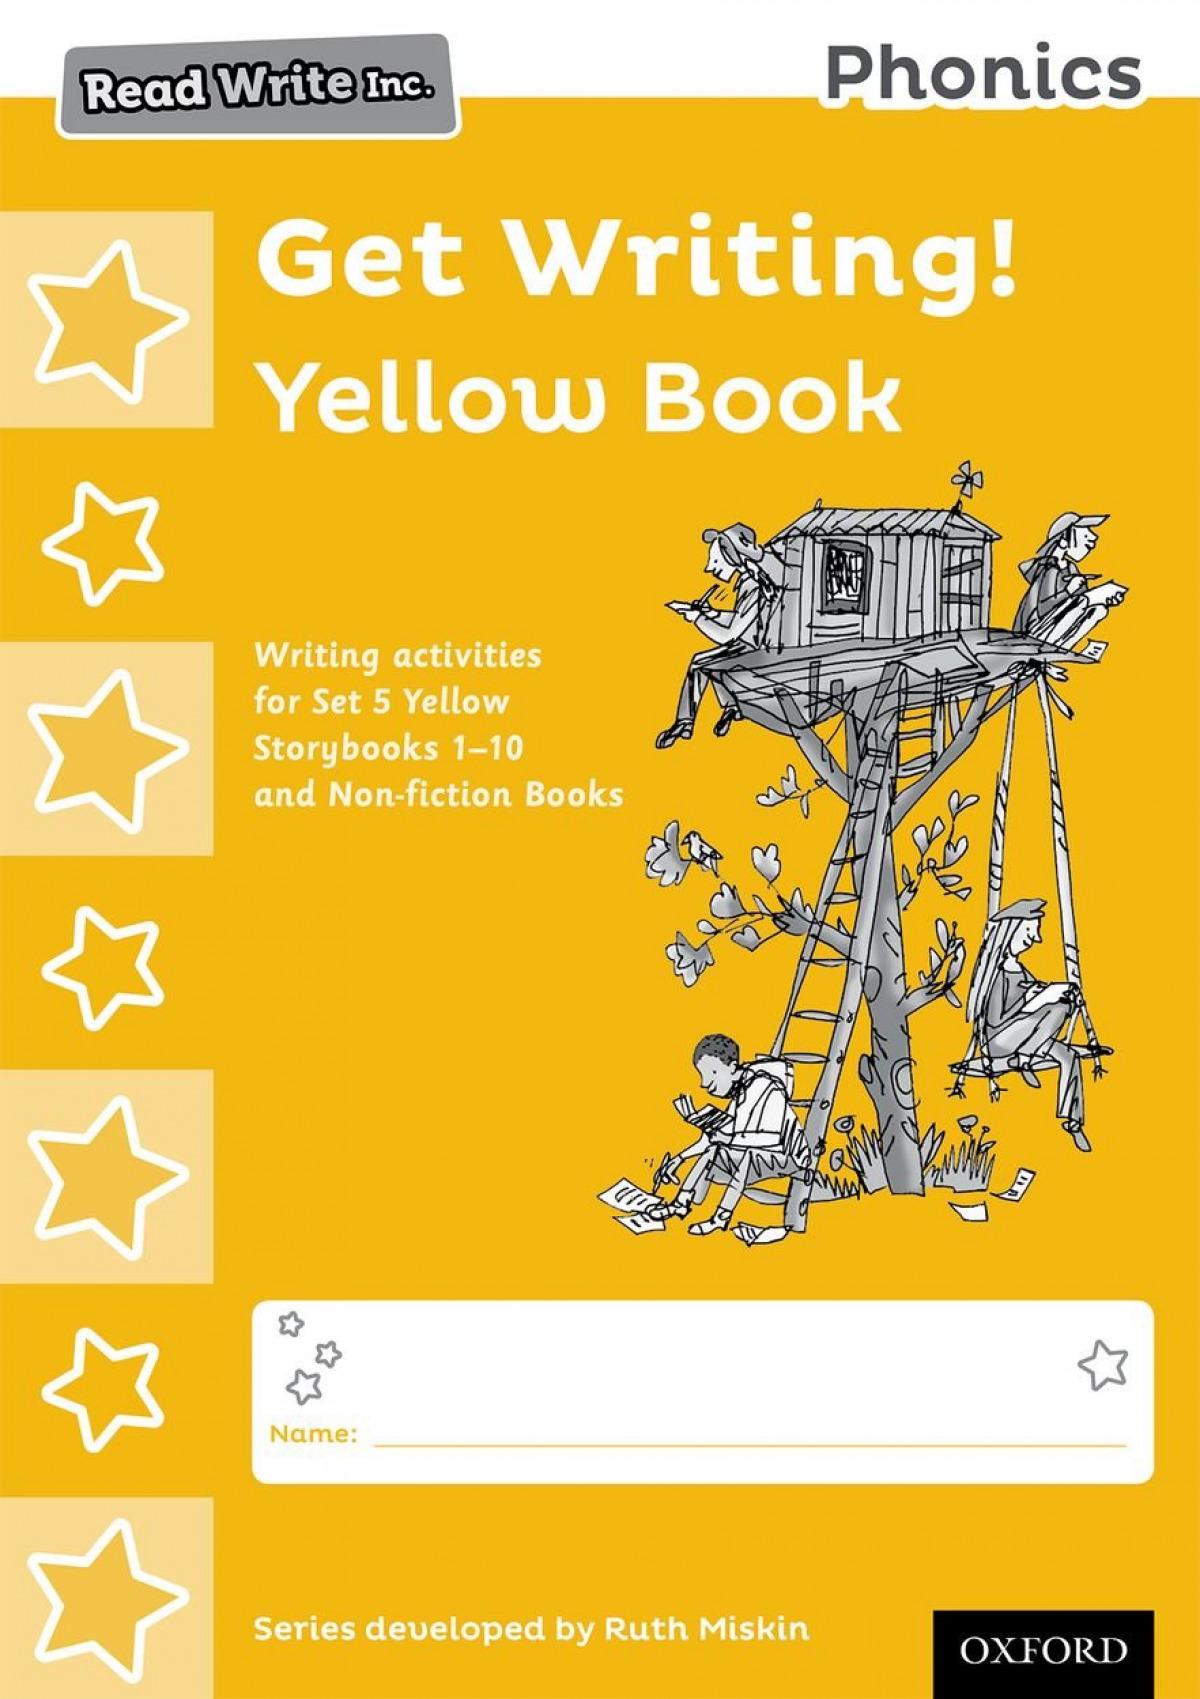 PACK 10 RED WRITE INC.PHONICS:GET WRITING YELLOW BOOK